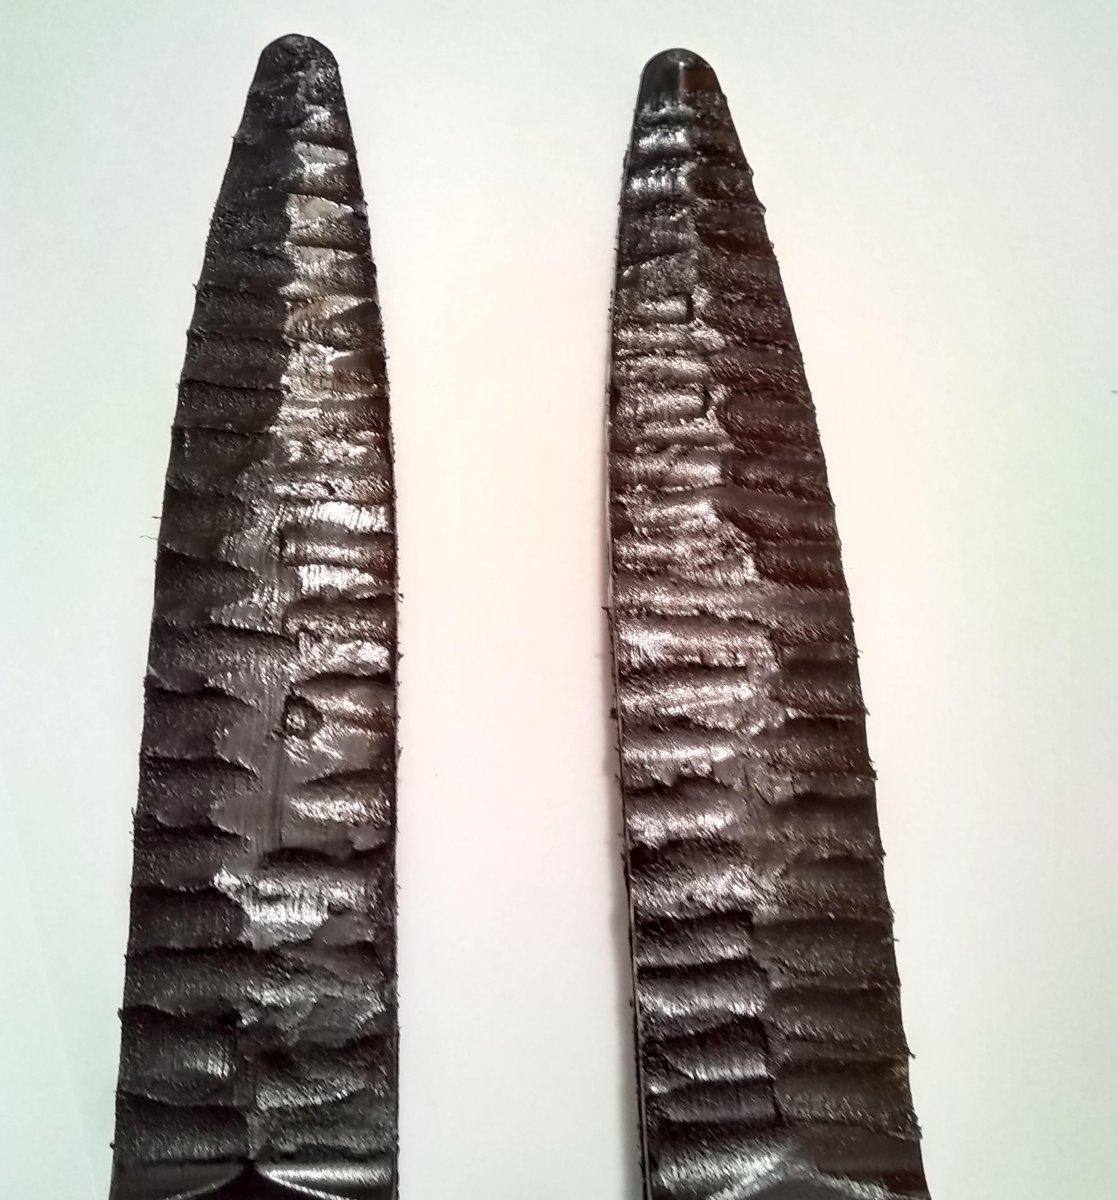 Blade Close Up (side 1)